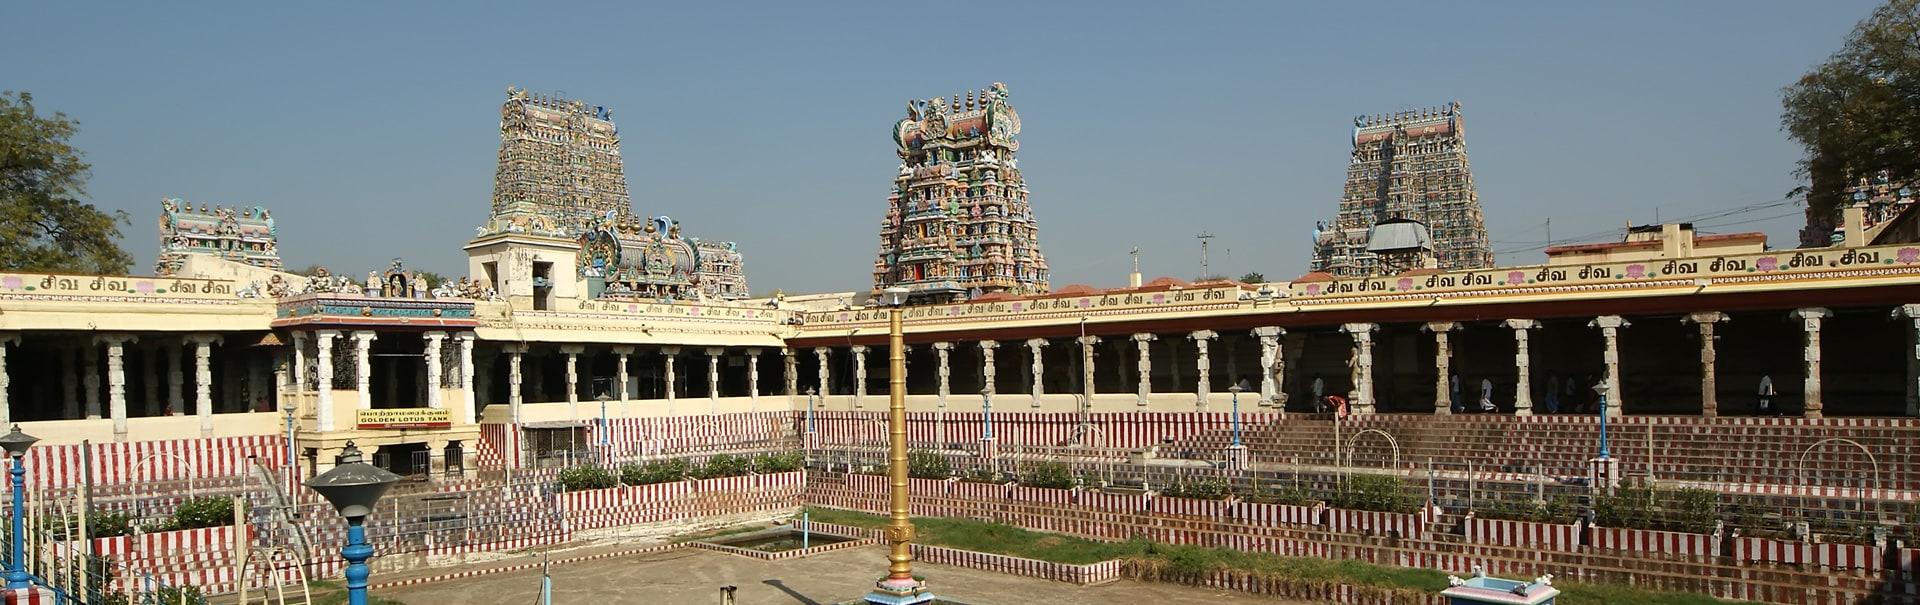 Madurai Rameswaram Thanjavur (SHTN9) Banner